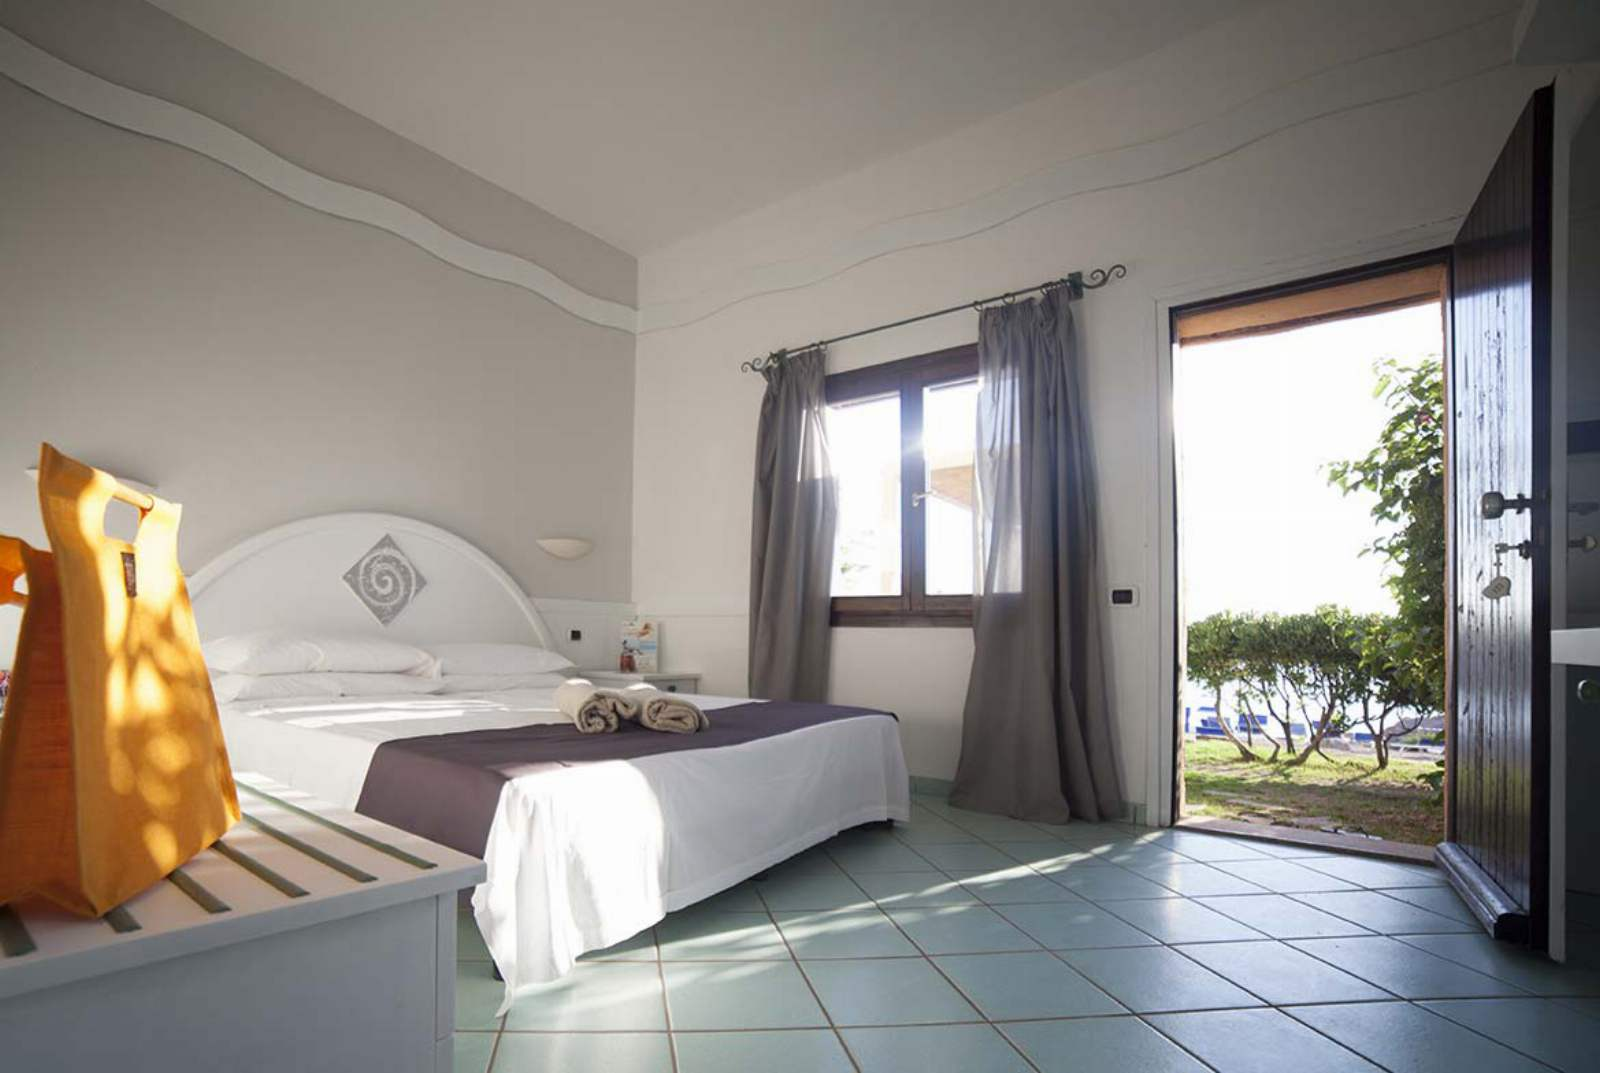 Santo Stefano Resort: room / property / locale photo. Image 6